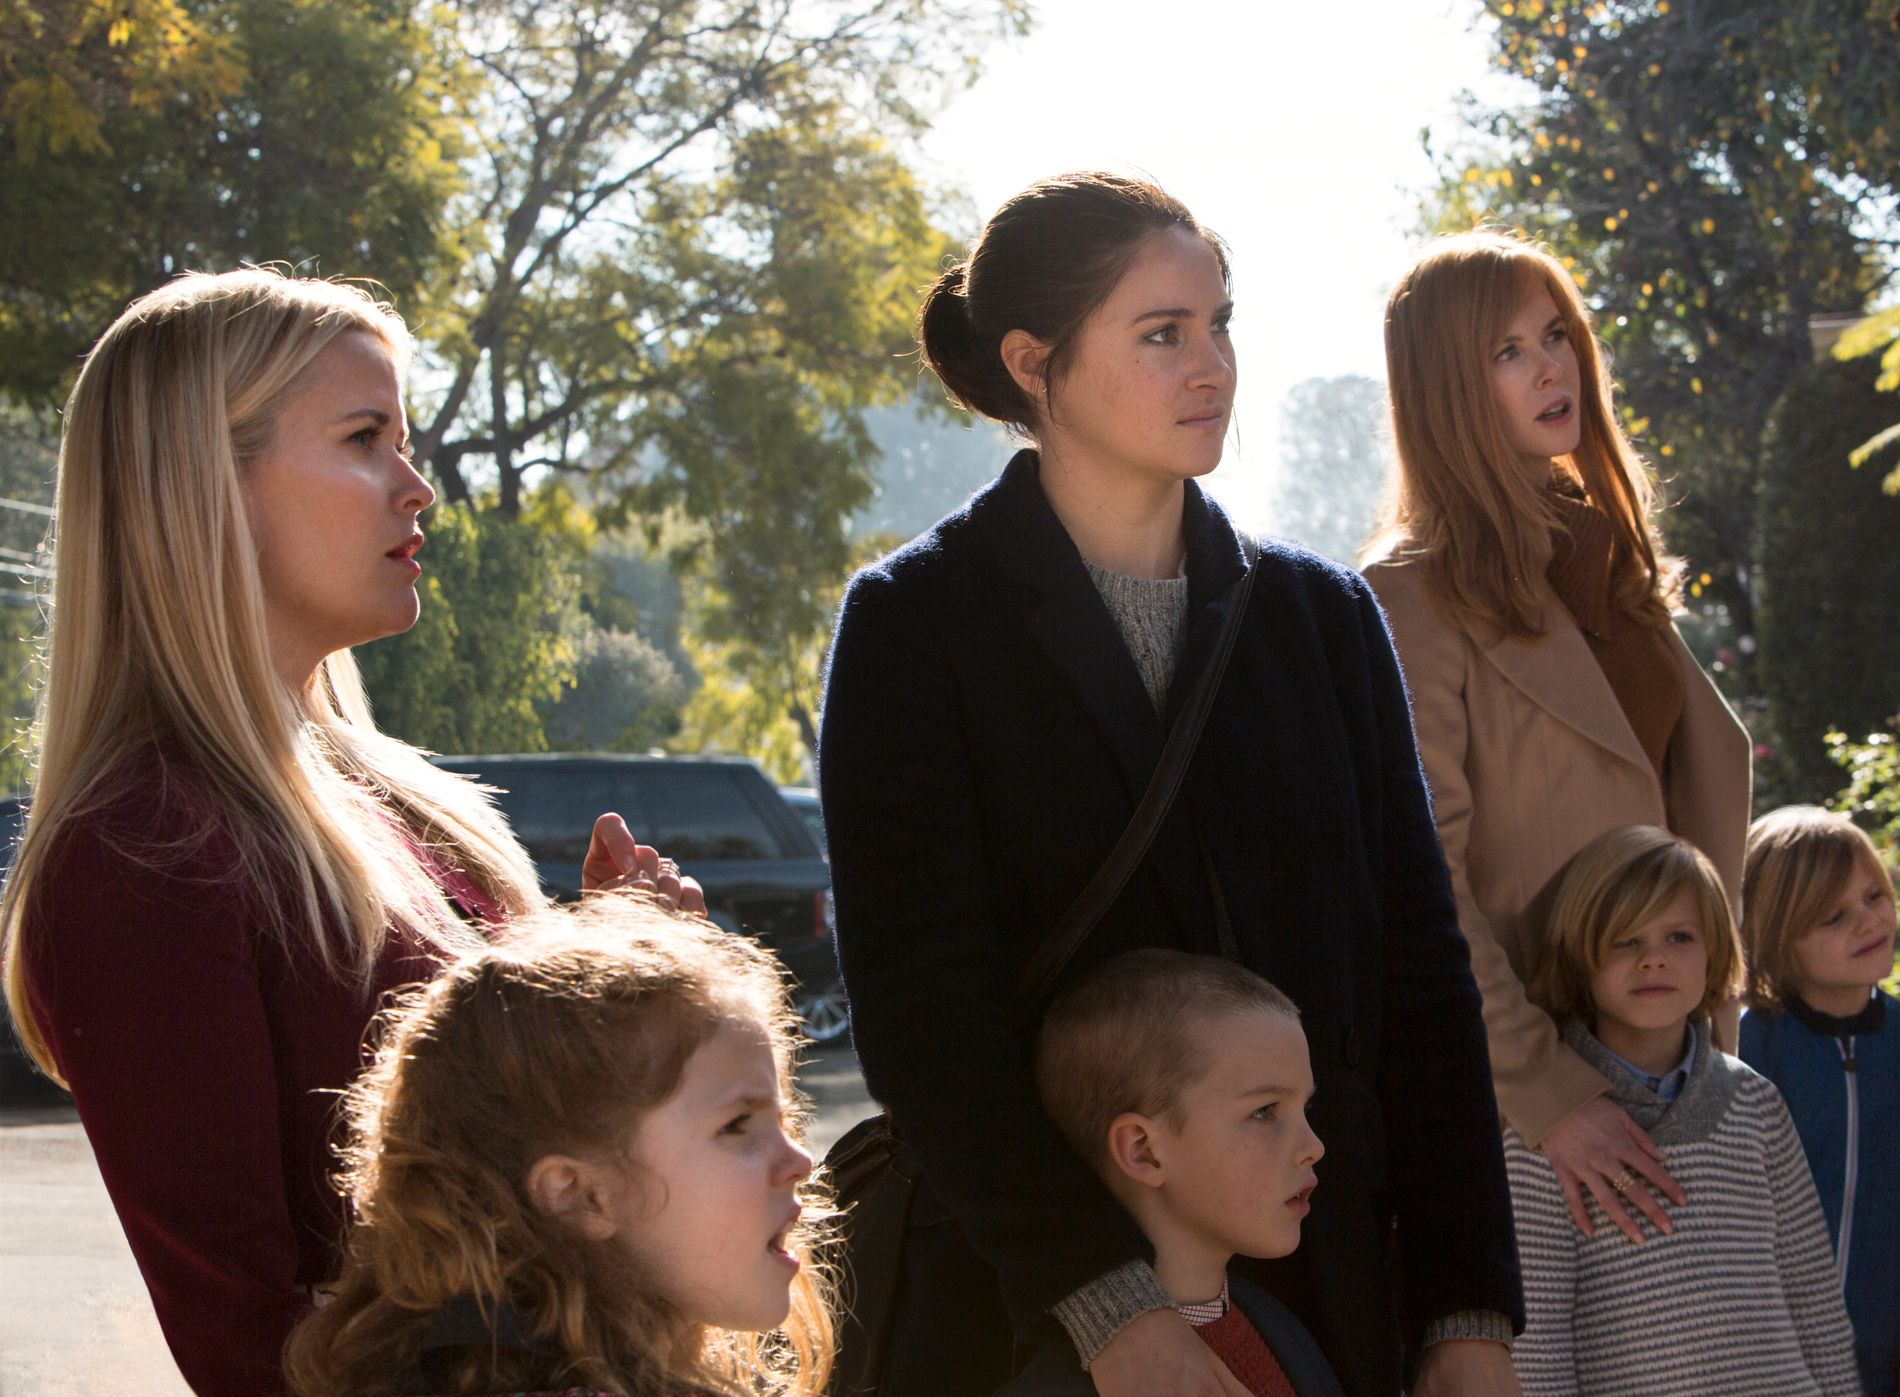 IDYLL: Småbyidyllen brister i «Big Little Lies». Her mer Reese Witherspoon, Shailene Woodley og Nicole Kidman. Foto: HBO